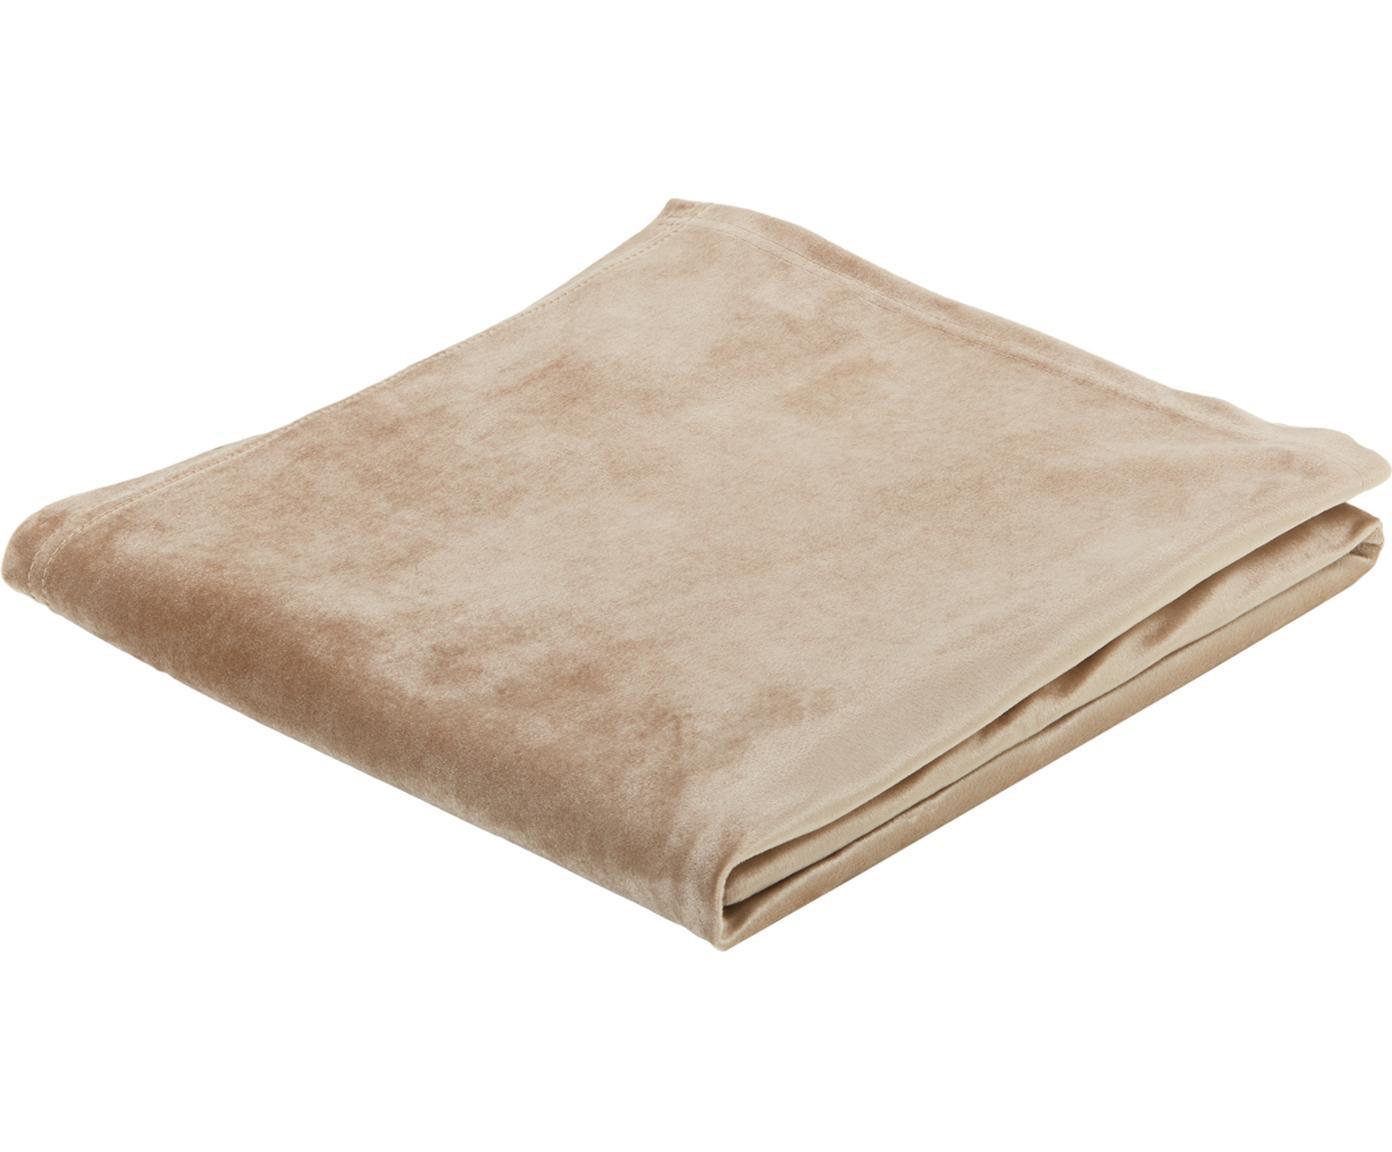 Fluwelen tafelkleed Simone, Polyesterfluweel, Beige, 145 x 145 cm